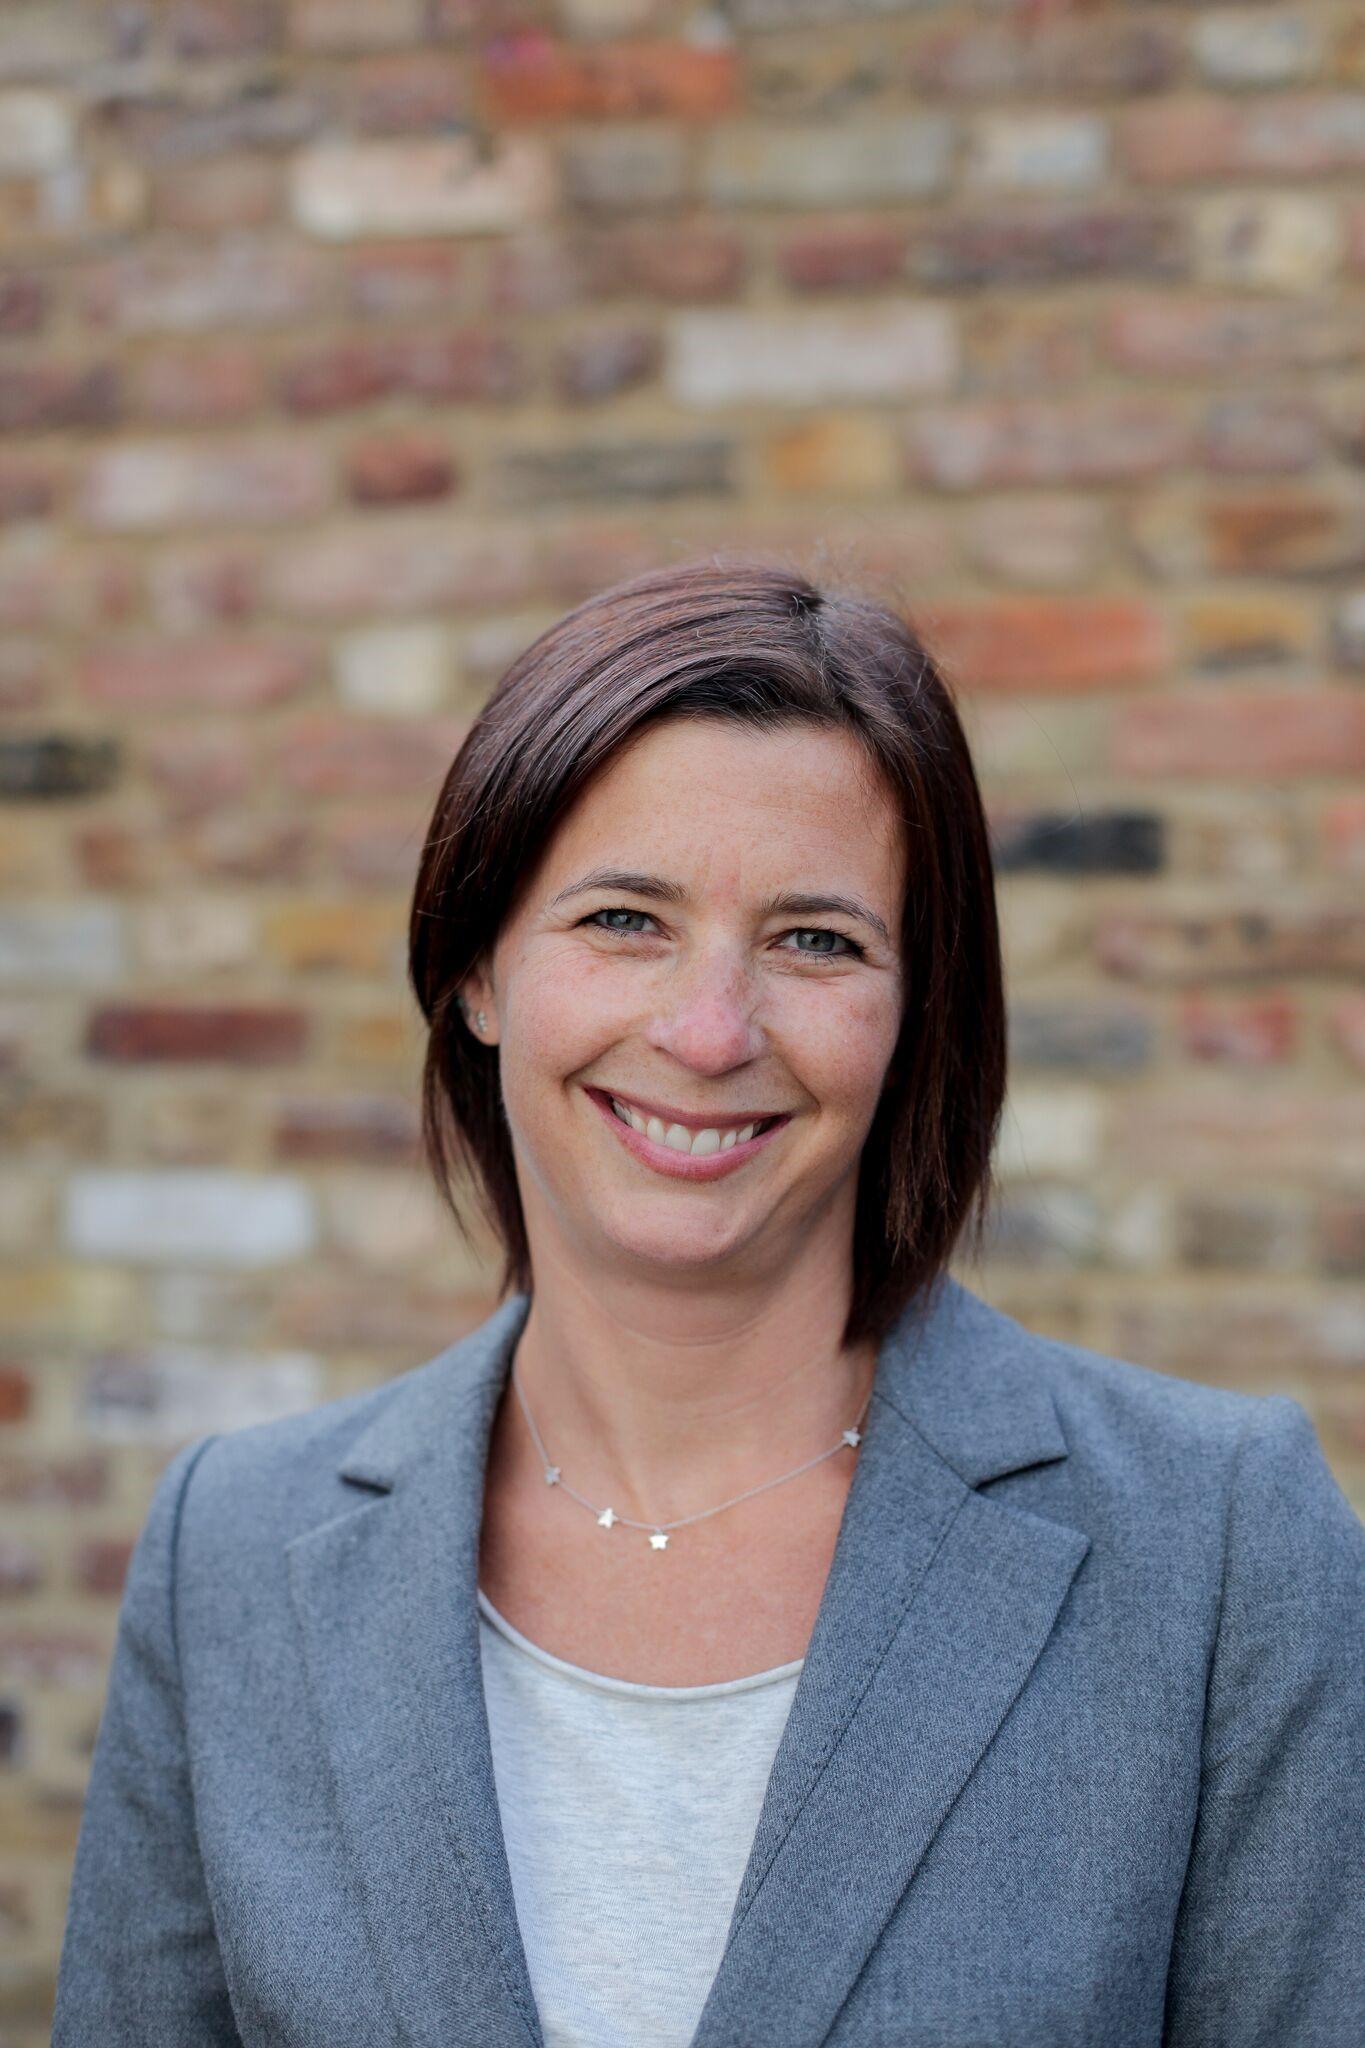 Sarah Lelic